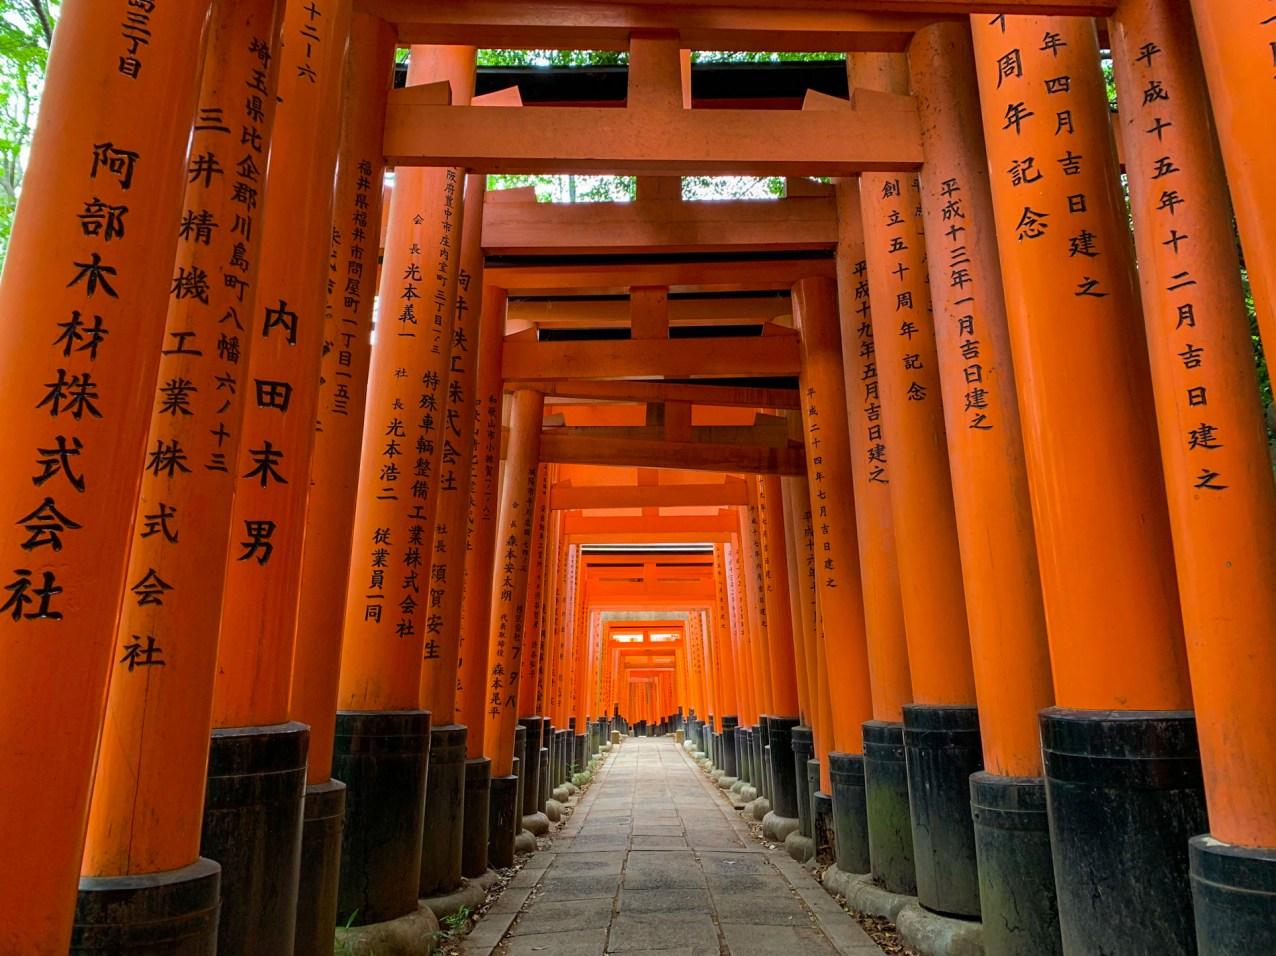 Tunnel of torii gates at the Fushimi Inari-taisha (伏見稲荷大社) shrine